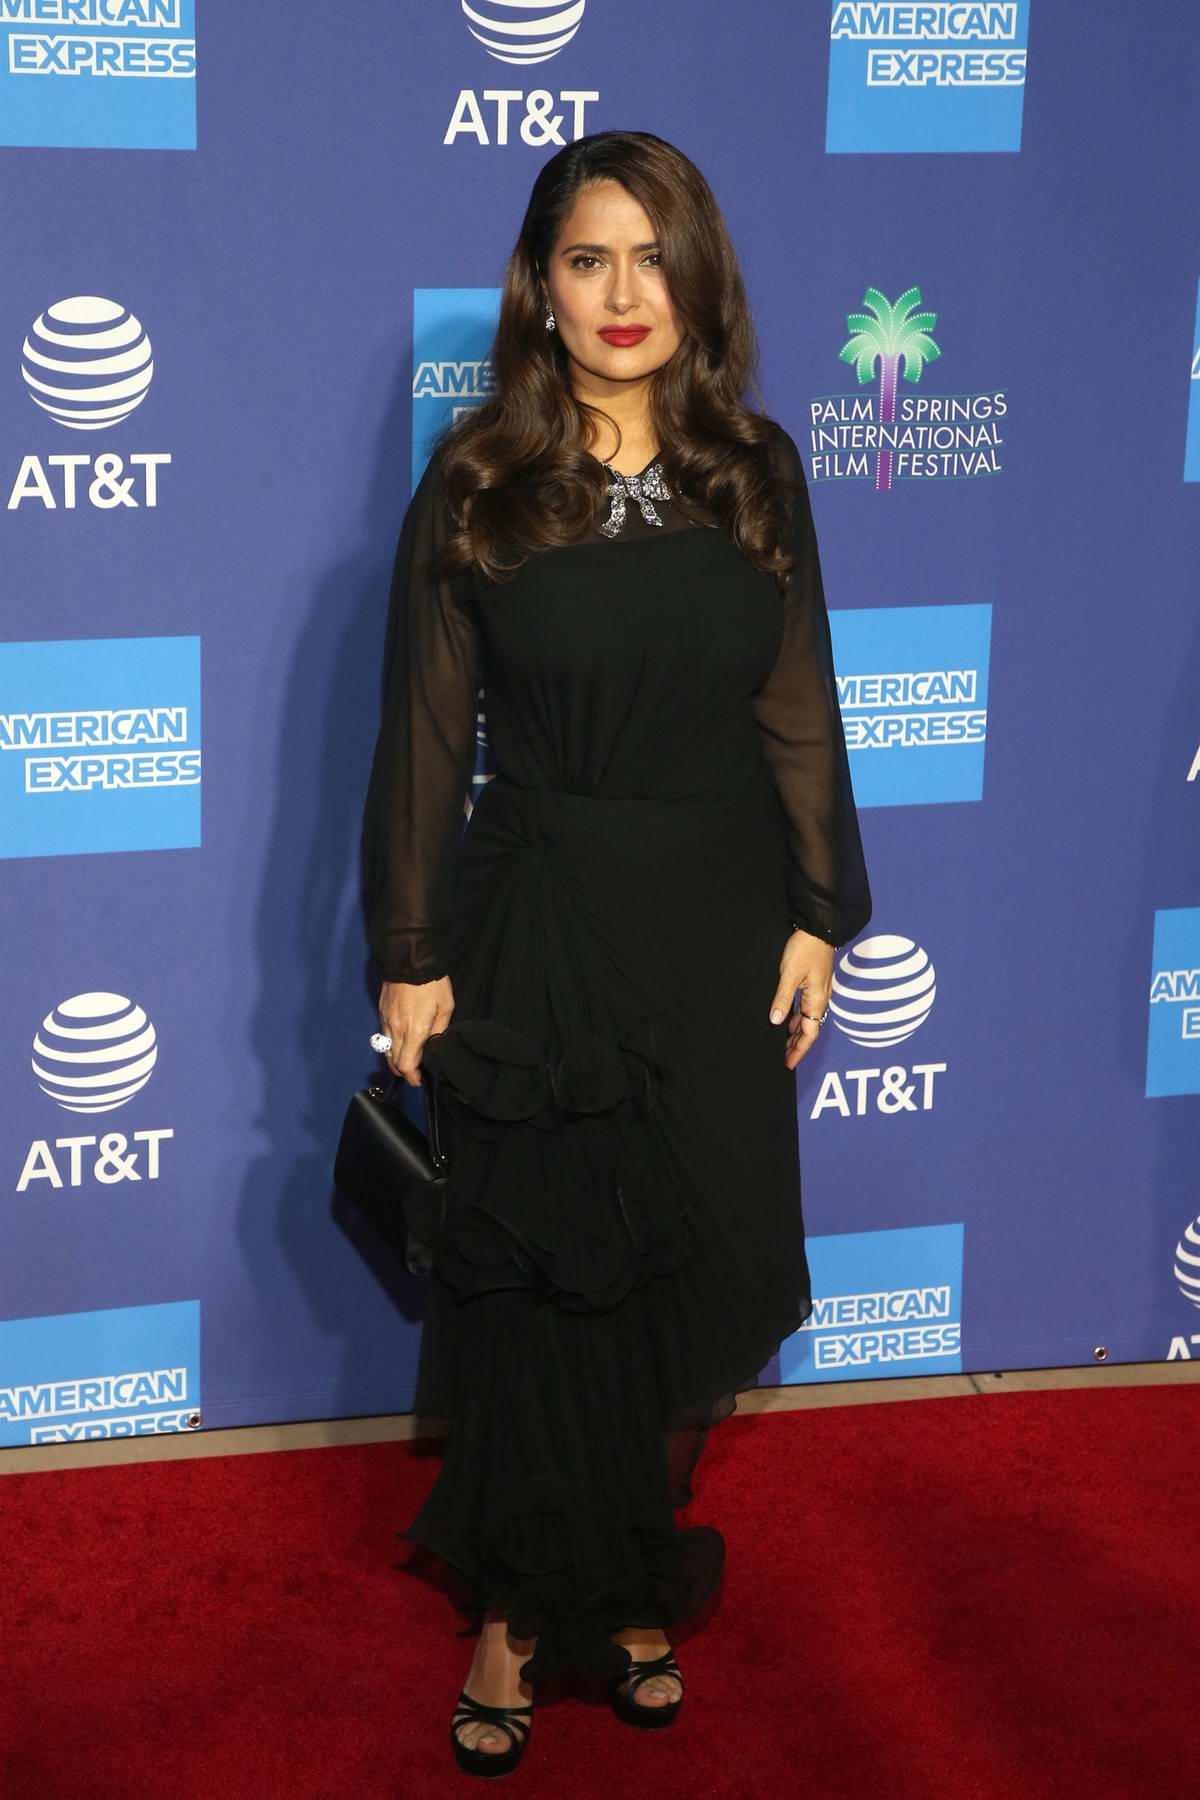 Salma Hayek attends the 31st Annual Palm Springs International Film Festival Gala in Palm Springs, California